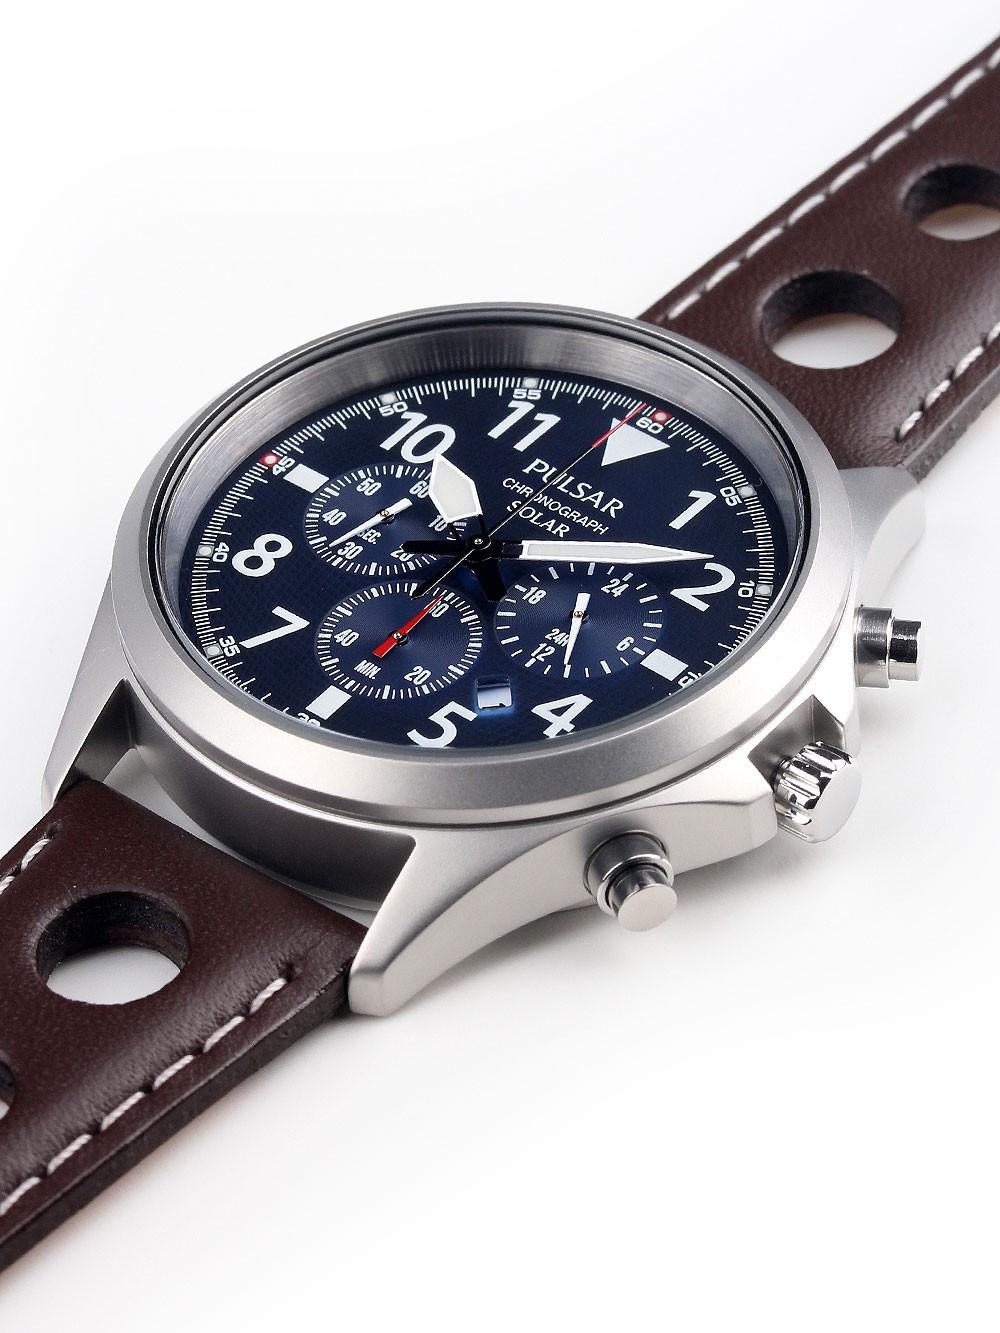 Watches Chrono12 Pulsar Px5029x1 Solar Chrono 43mm